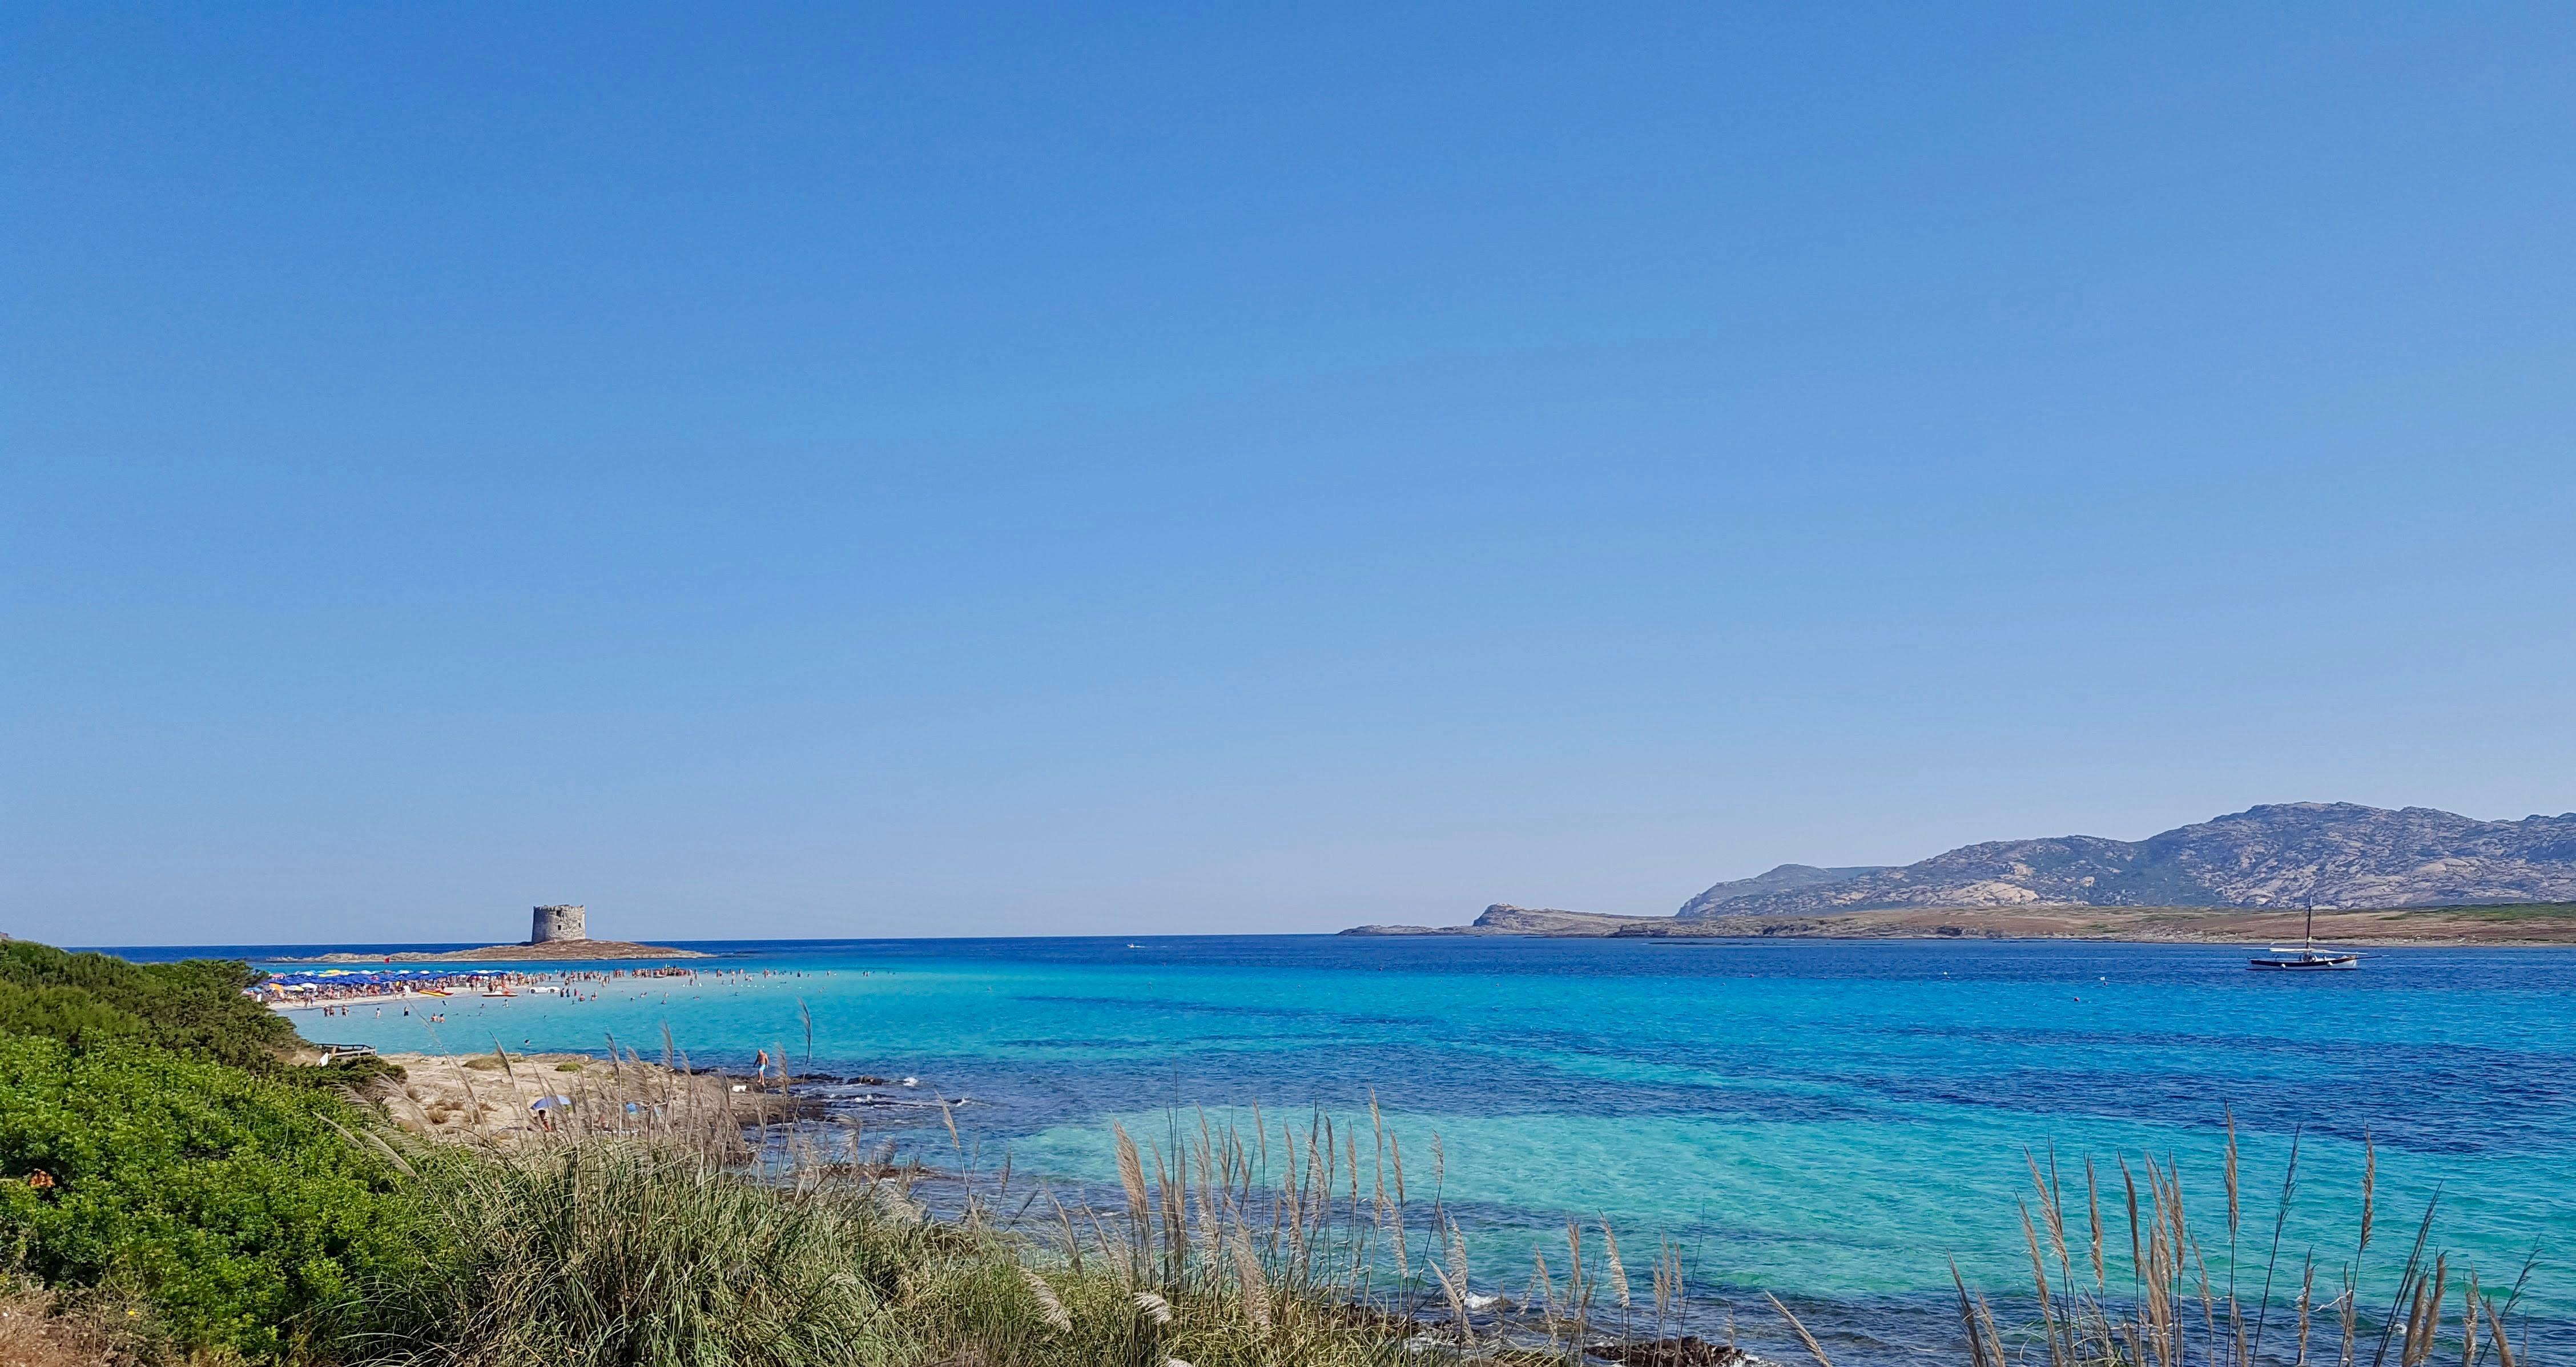 Experience Local Water Blue White Sand Elafonissi beach Crete Summer Holiday Experience Adventure Sea Greece Navagio Beach Zakynthos Shipwreck Beach Smuggler's Cove Island Konnos bay beach Cyprus La Pelosa Beach Stintino Sardinia Italy